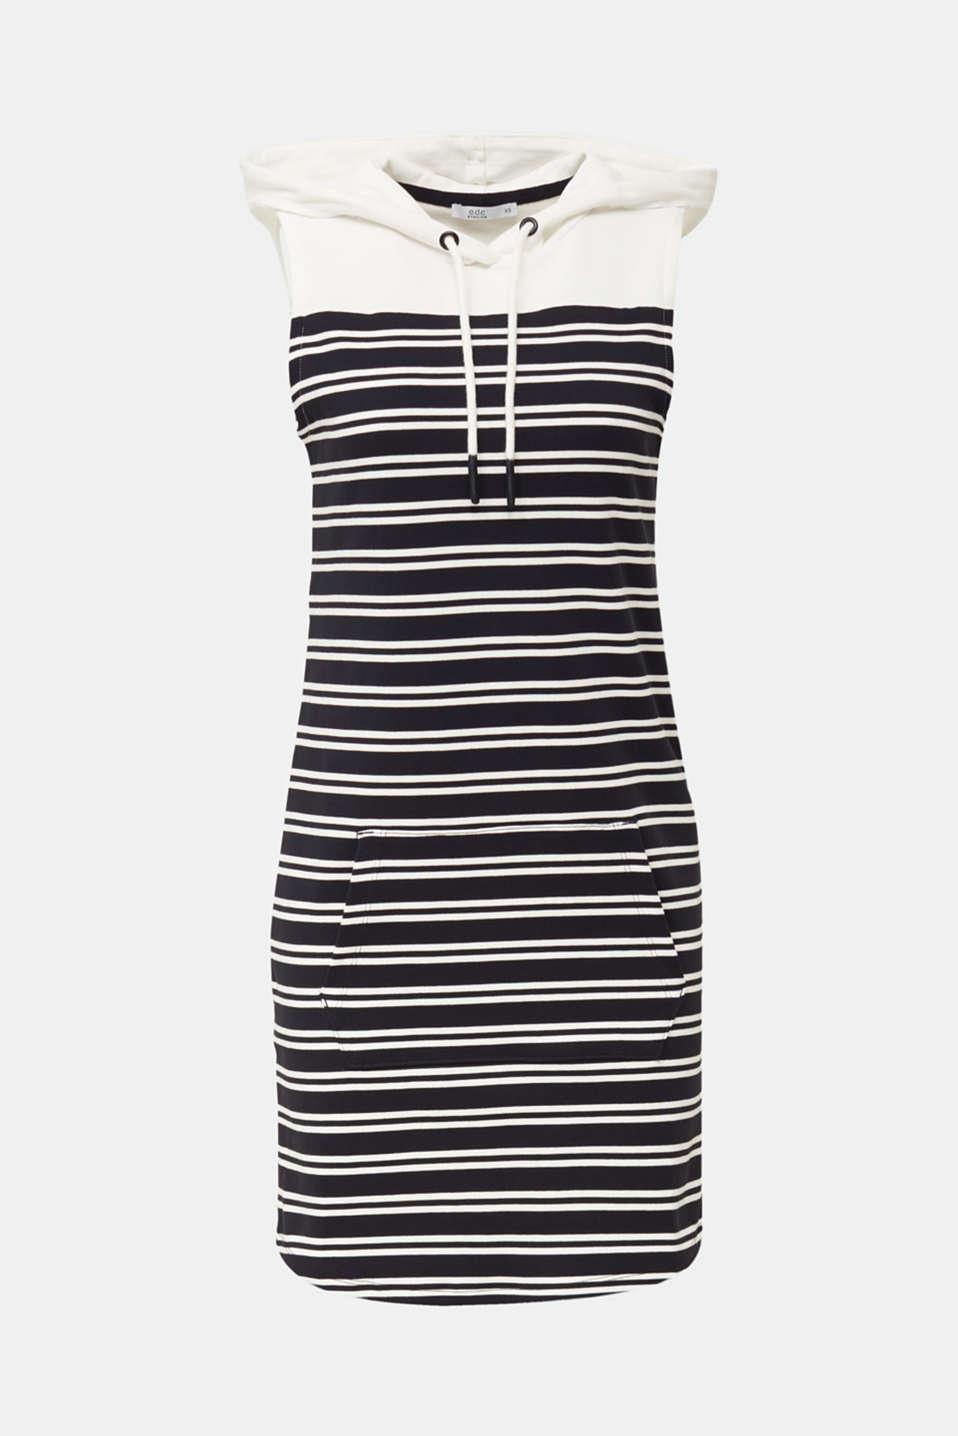 Hoodie sweatshirt dress, 100% cotton, BLACK, detail image number 7